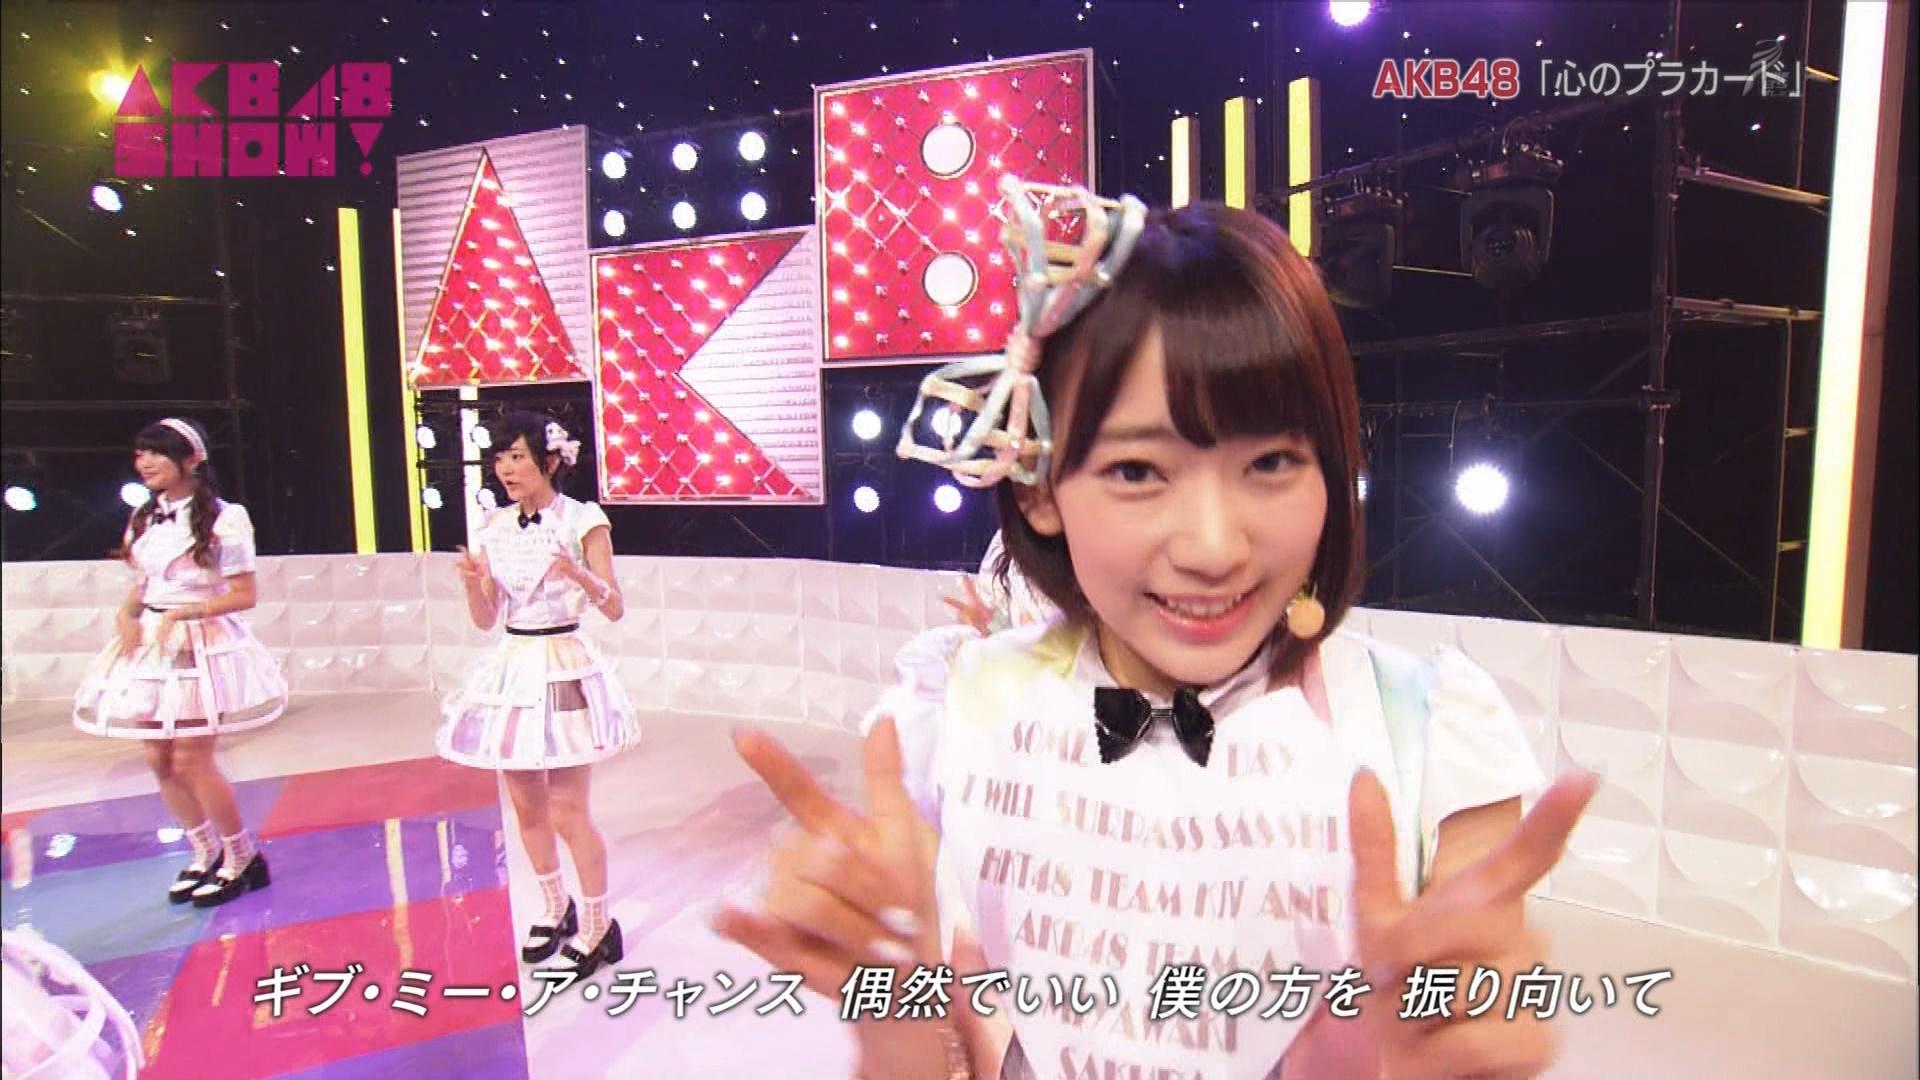 AKB48SHOW 心のプラカード 宮脇咲良 20140830 (15)